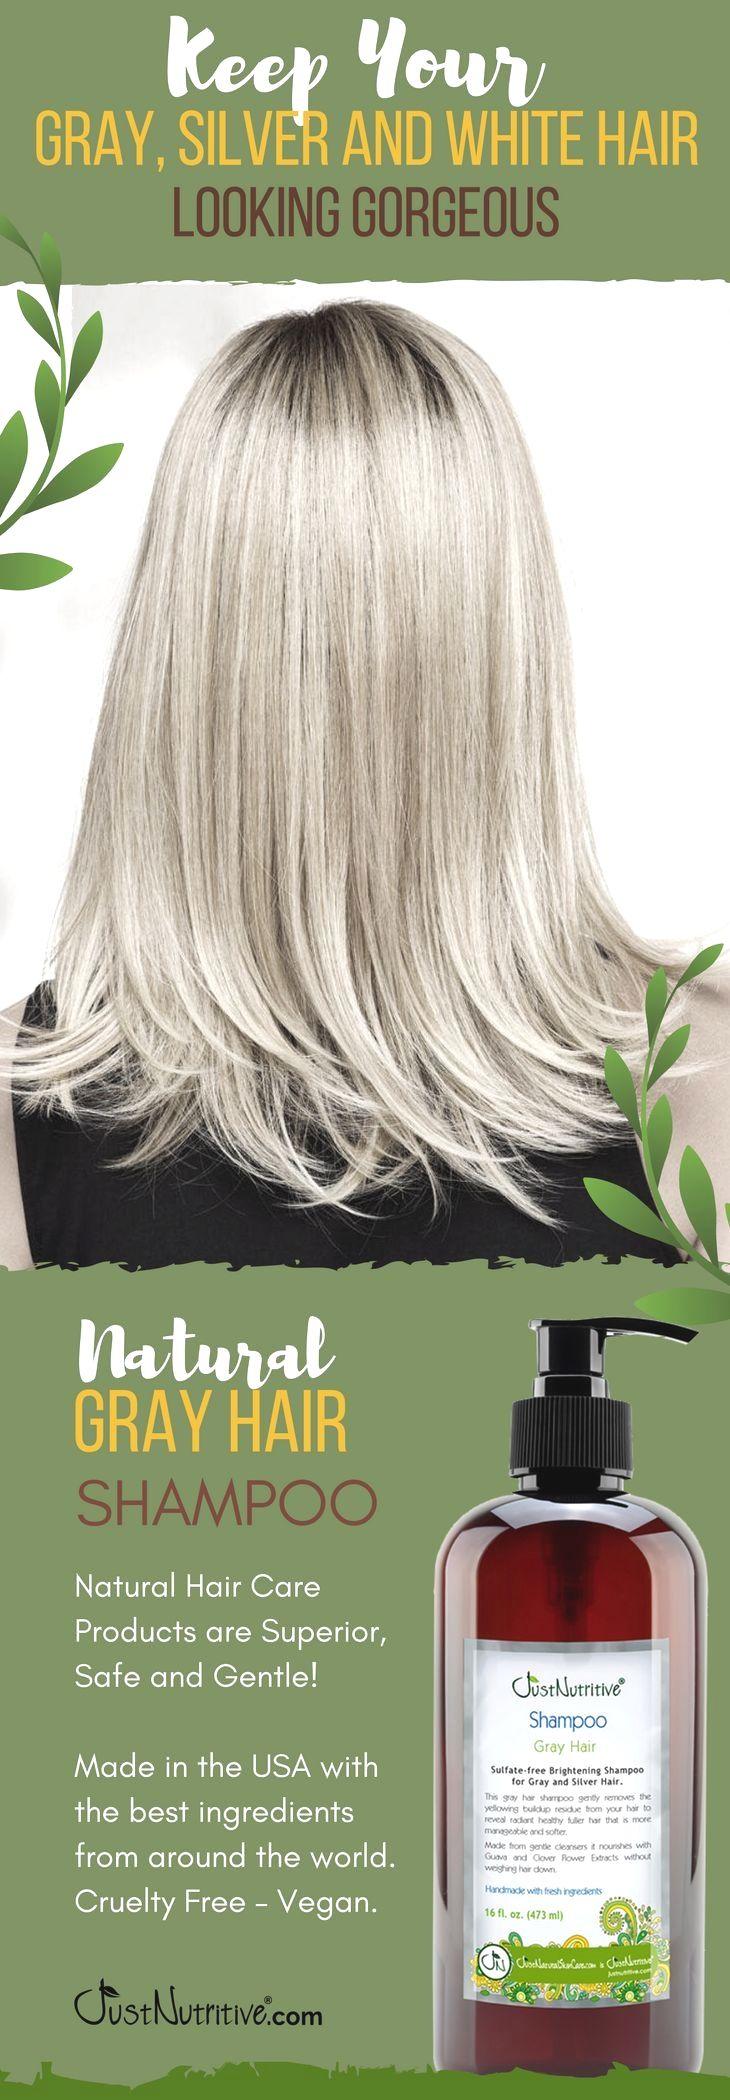 Www Justnutritive Com Gray Hair Nutritive Shampoo Spain Travel Accédez à Notre Site Beaucoup Plus Shampoo For Gray Hair Grey Hair Care Natural Hair Shampoo